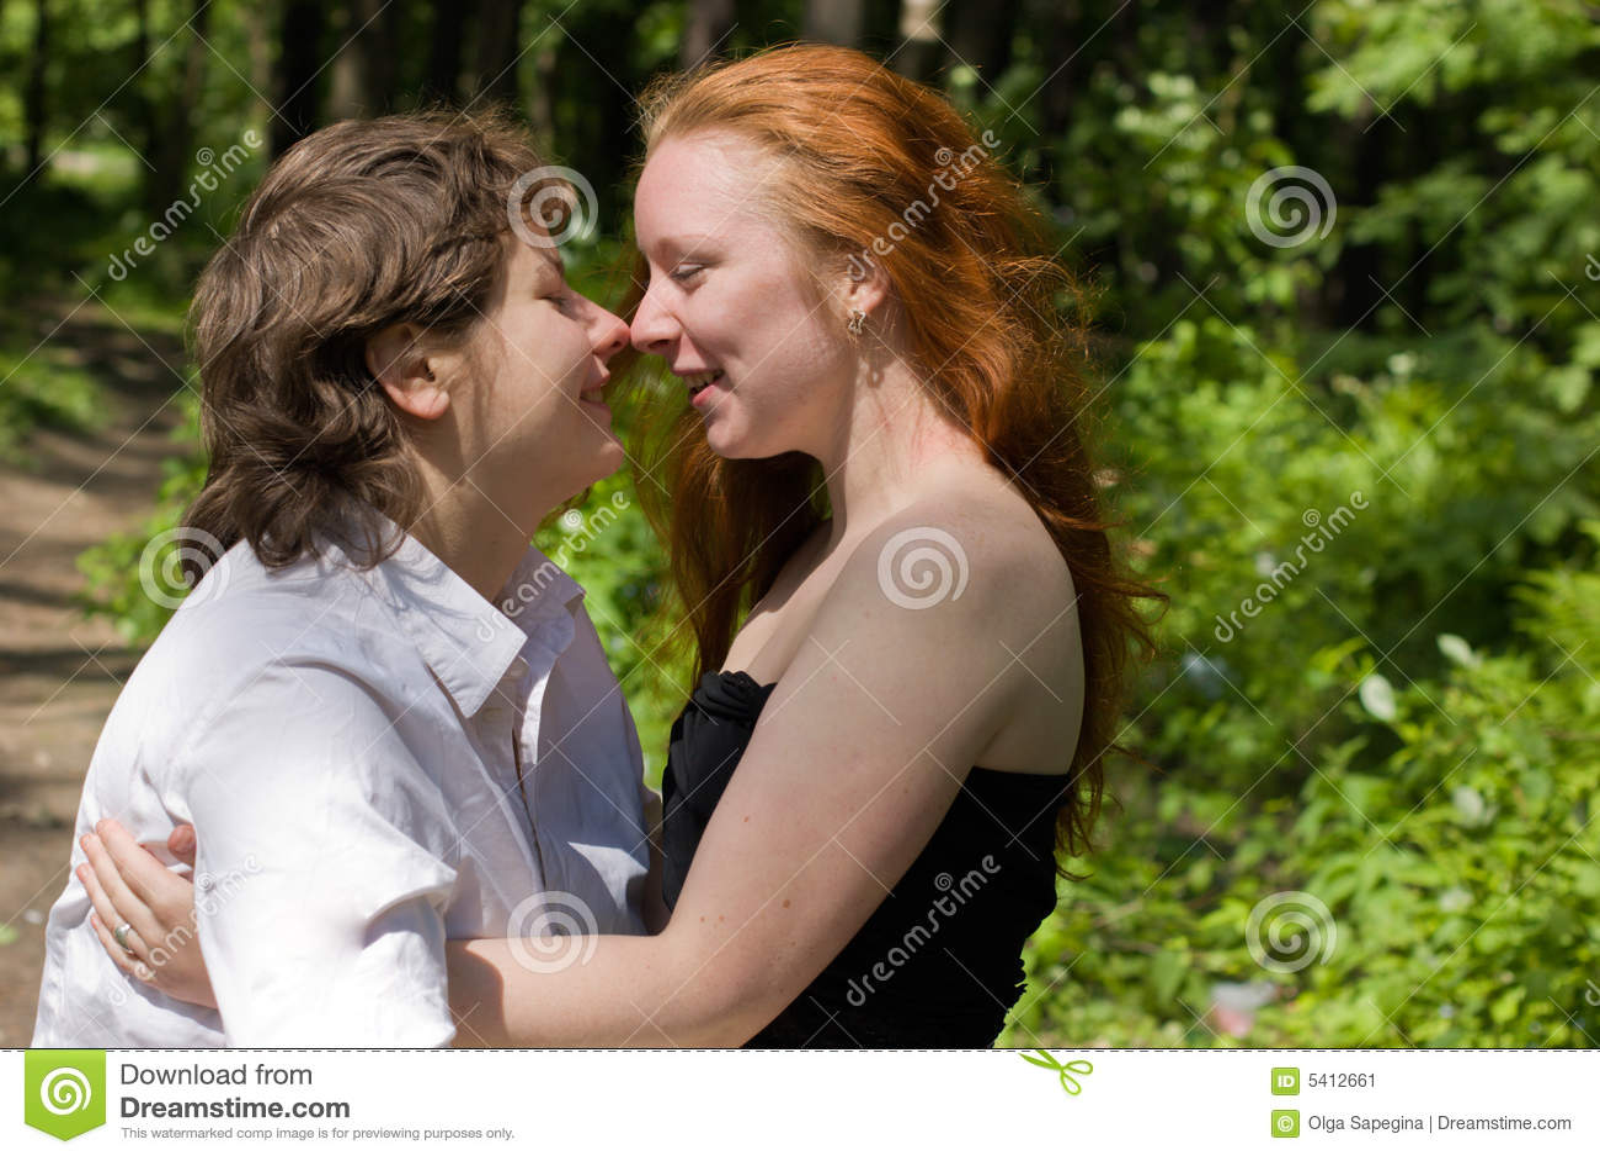 Lesbian Lip Kissing Videos